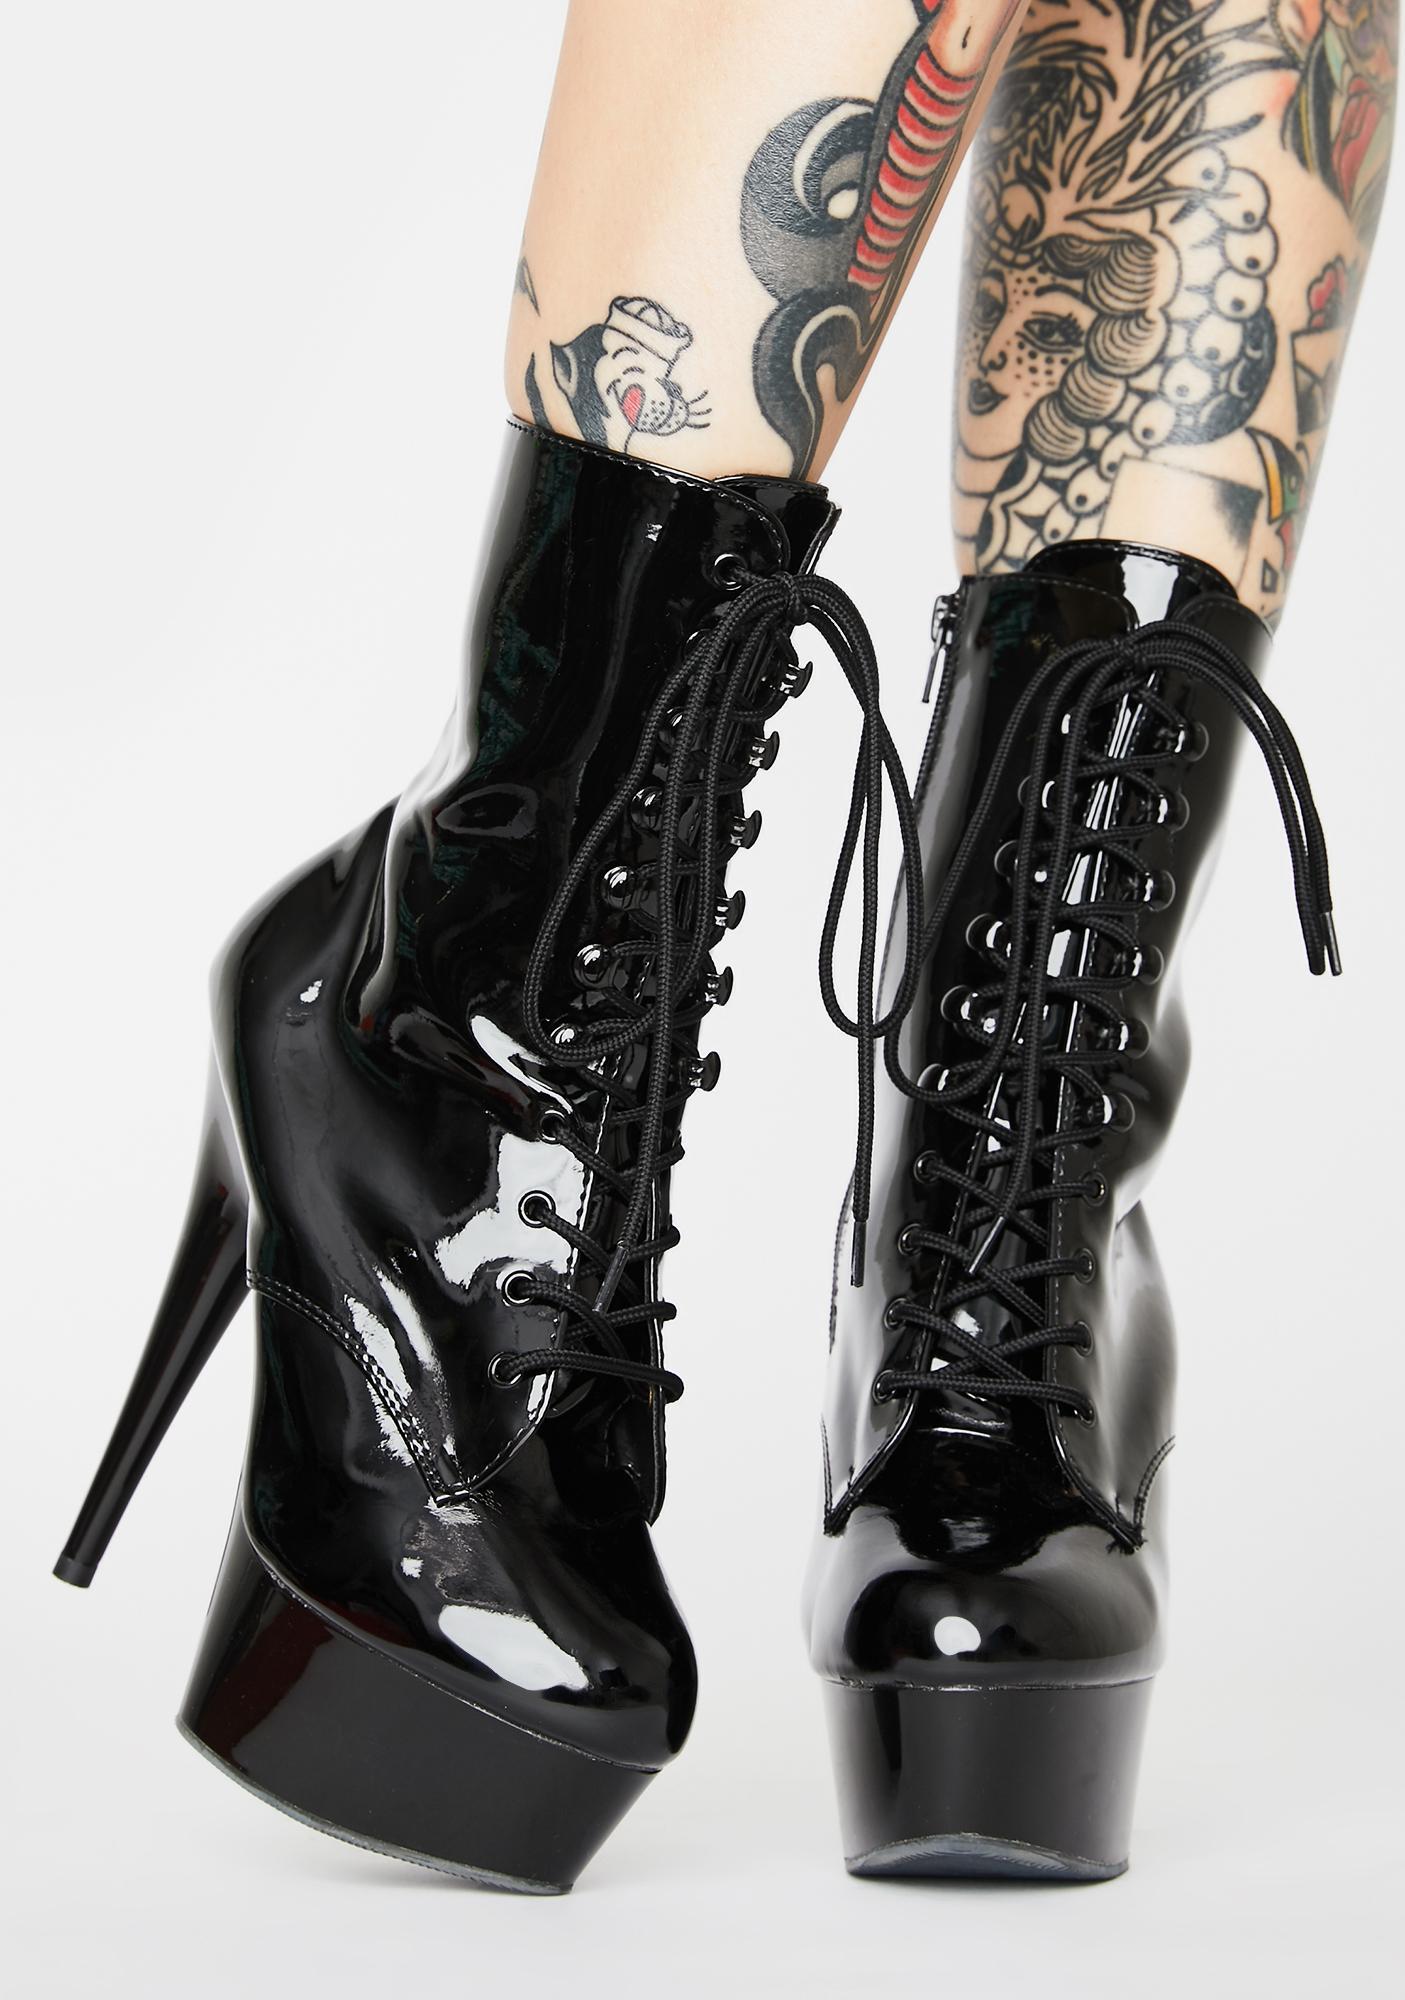 Pleaser Sinful Addiction Stiletto Boots